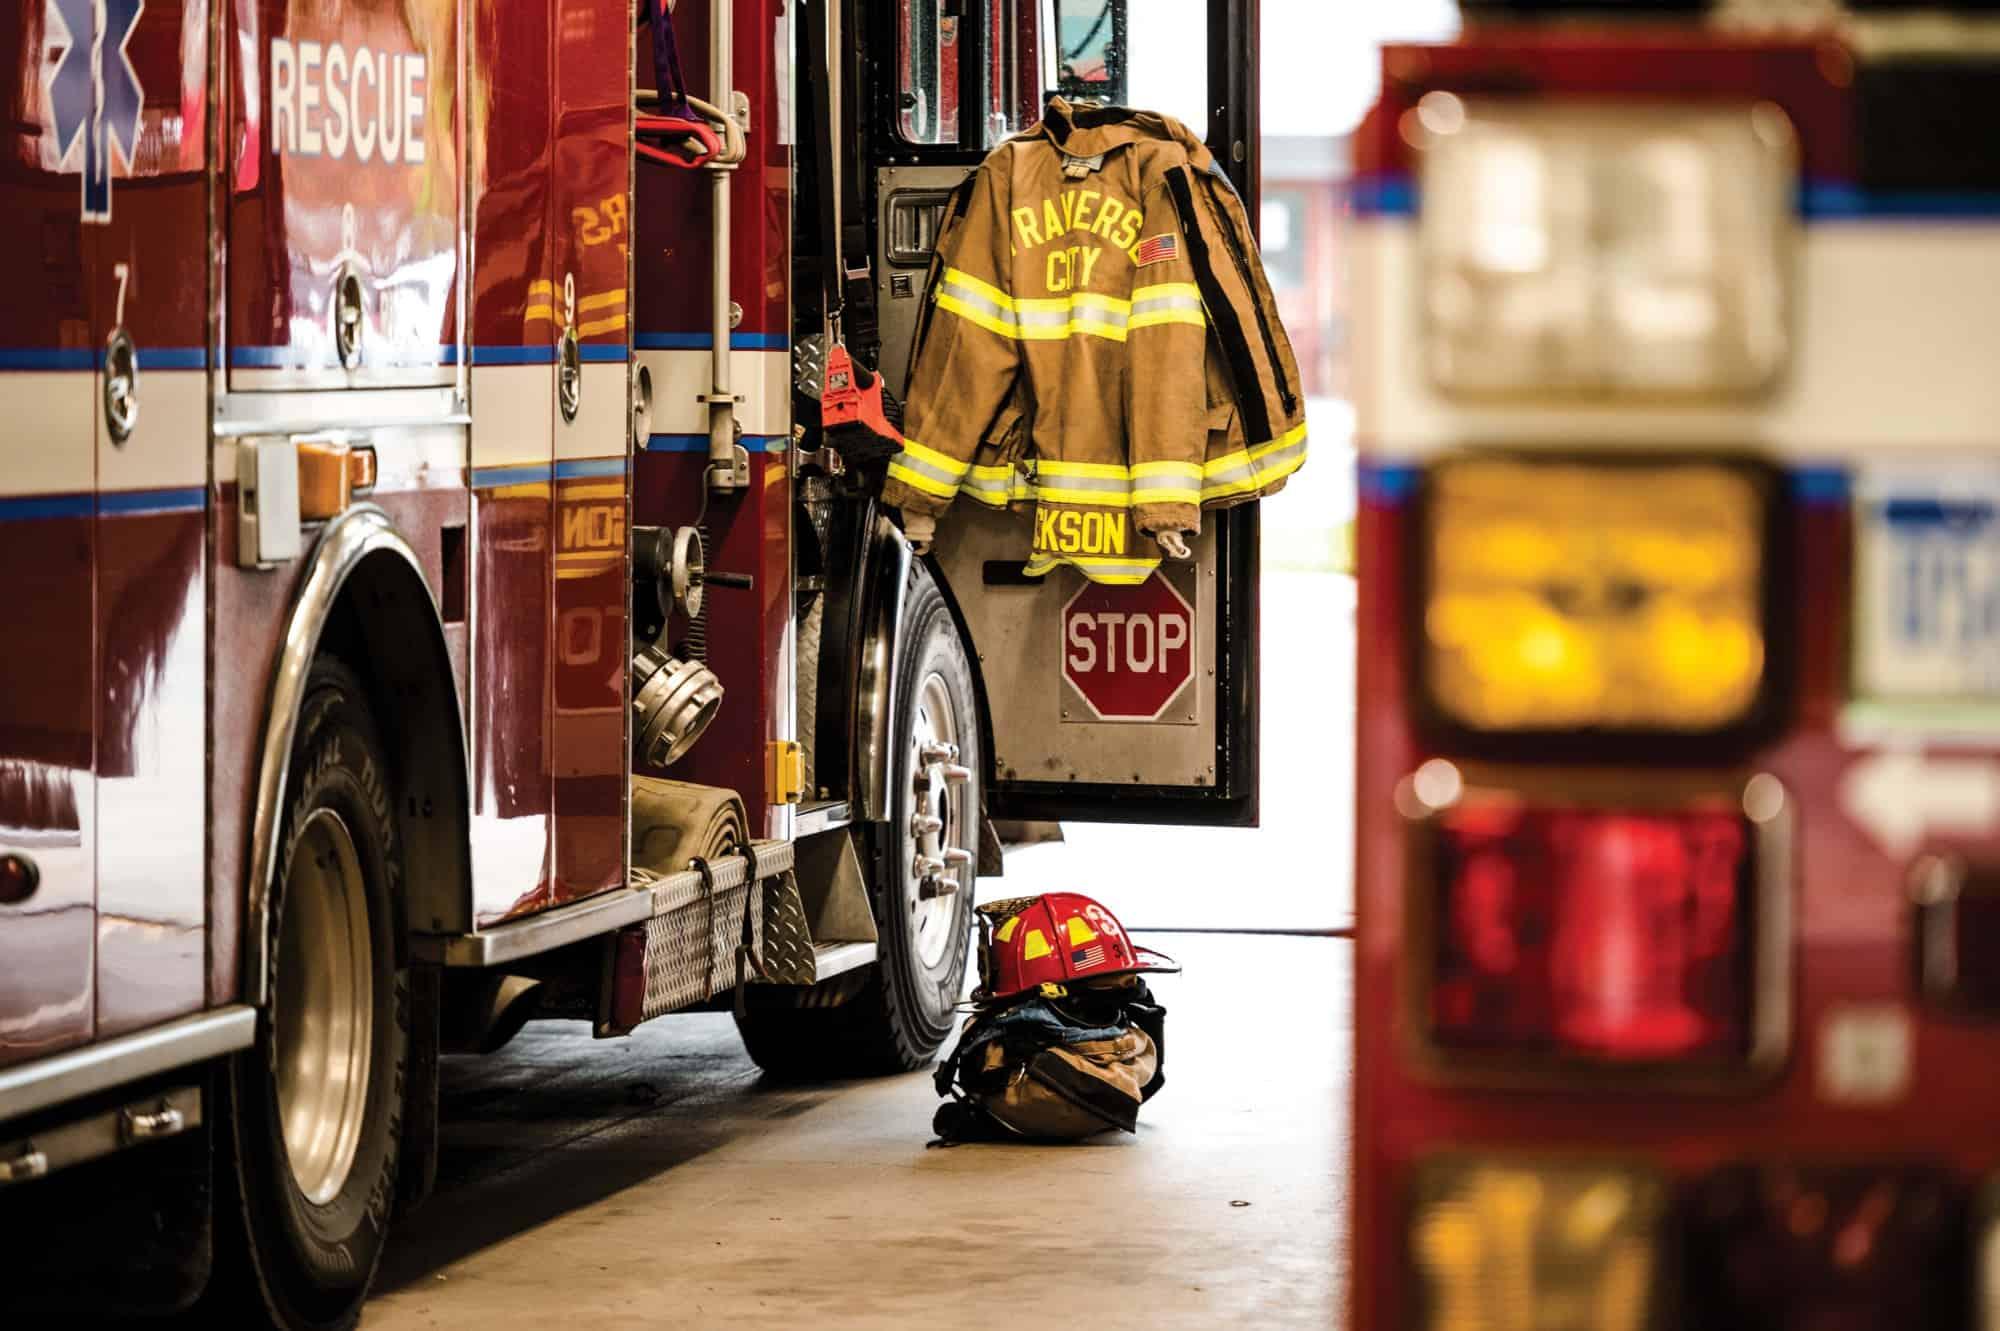 Traverse City firefighter trucks and uniform.